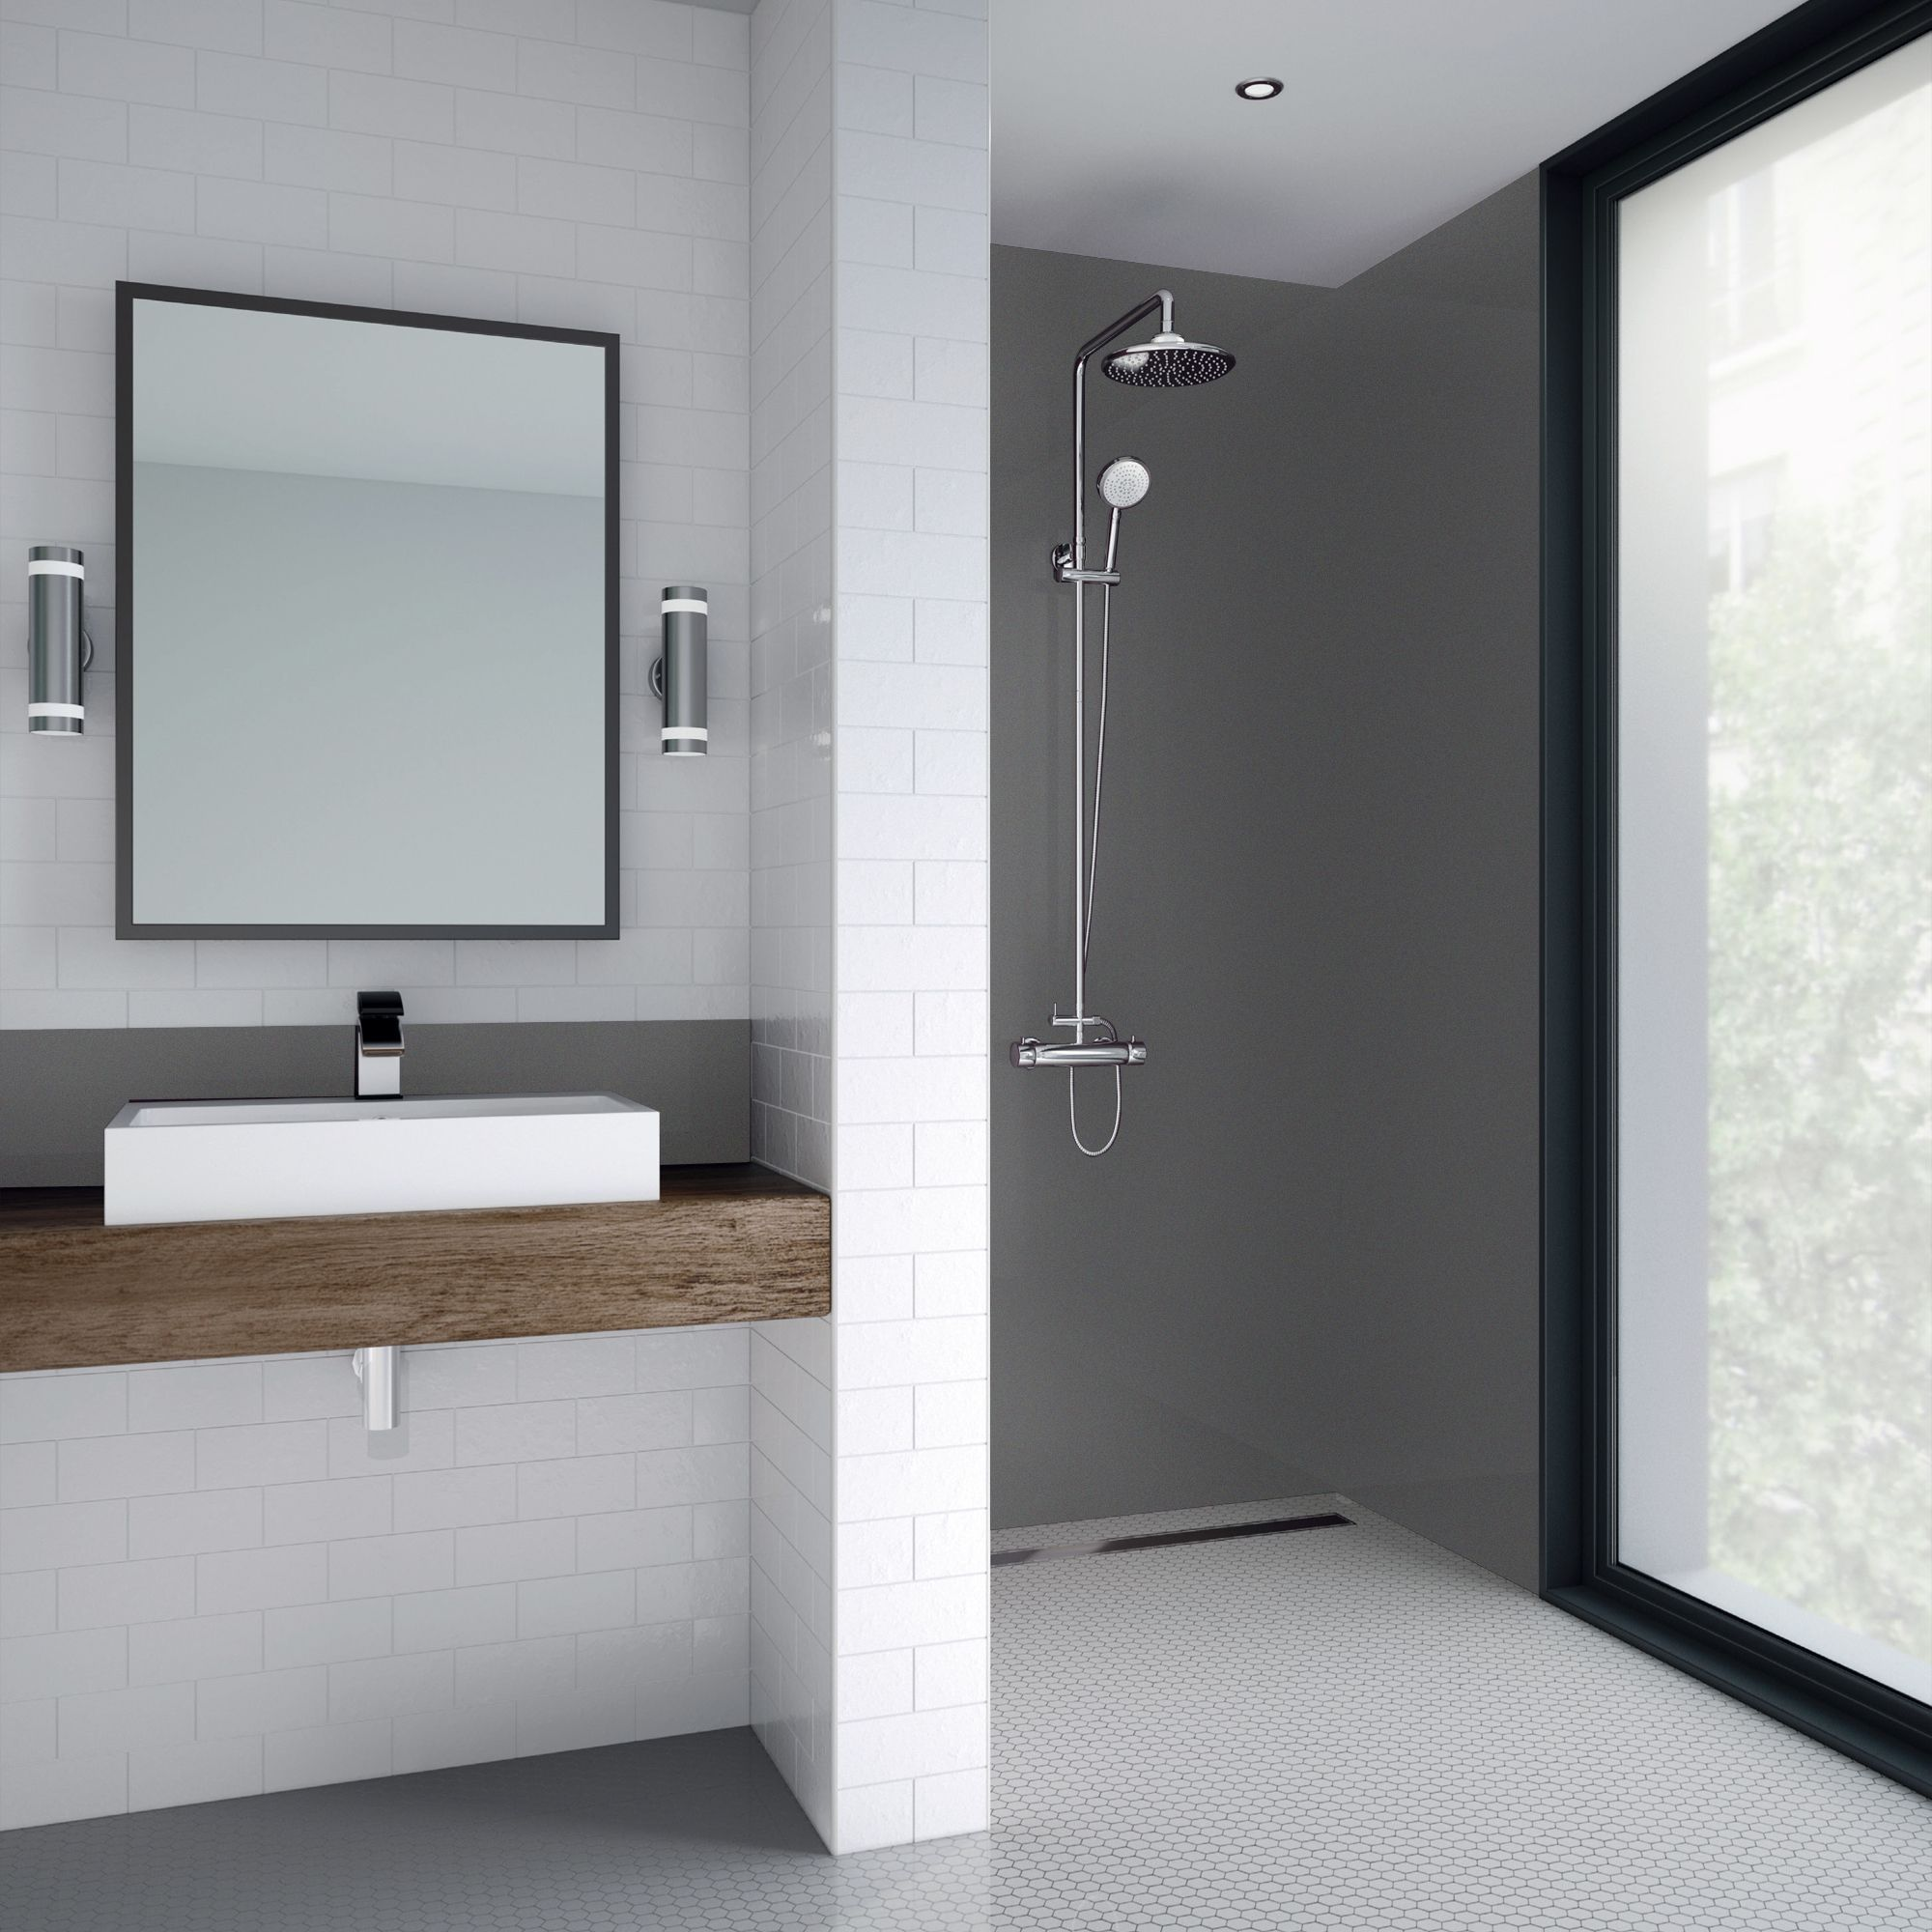 Pin By Joe Mcshane On Bathroom Ideas In 2020 Shower Panels Shower Wall Kits Shower